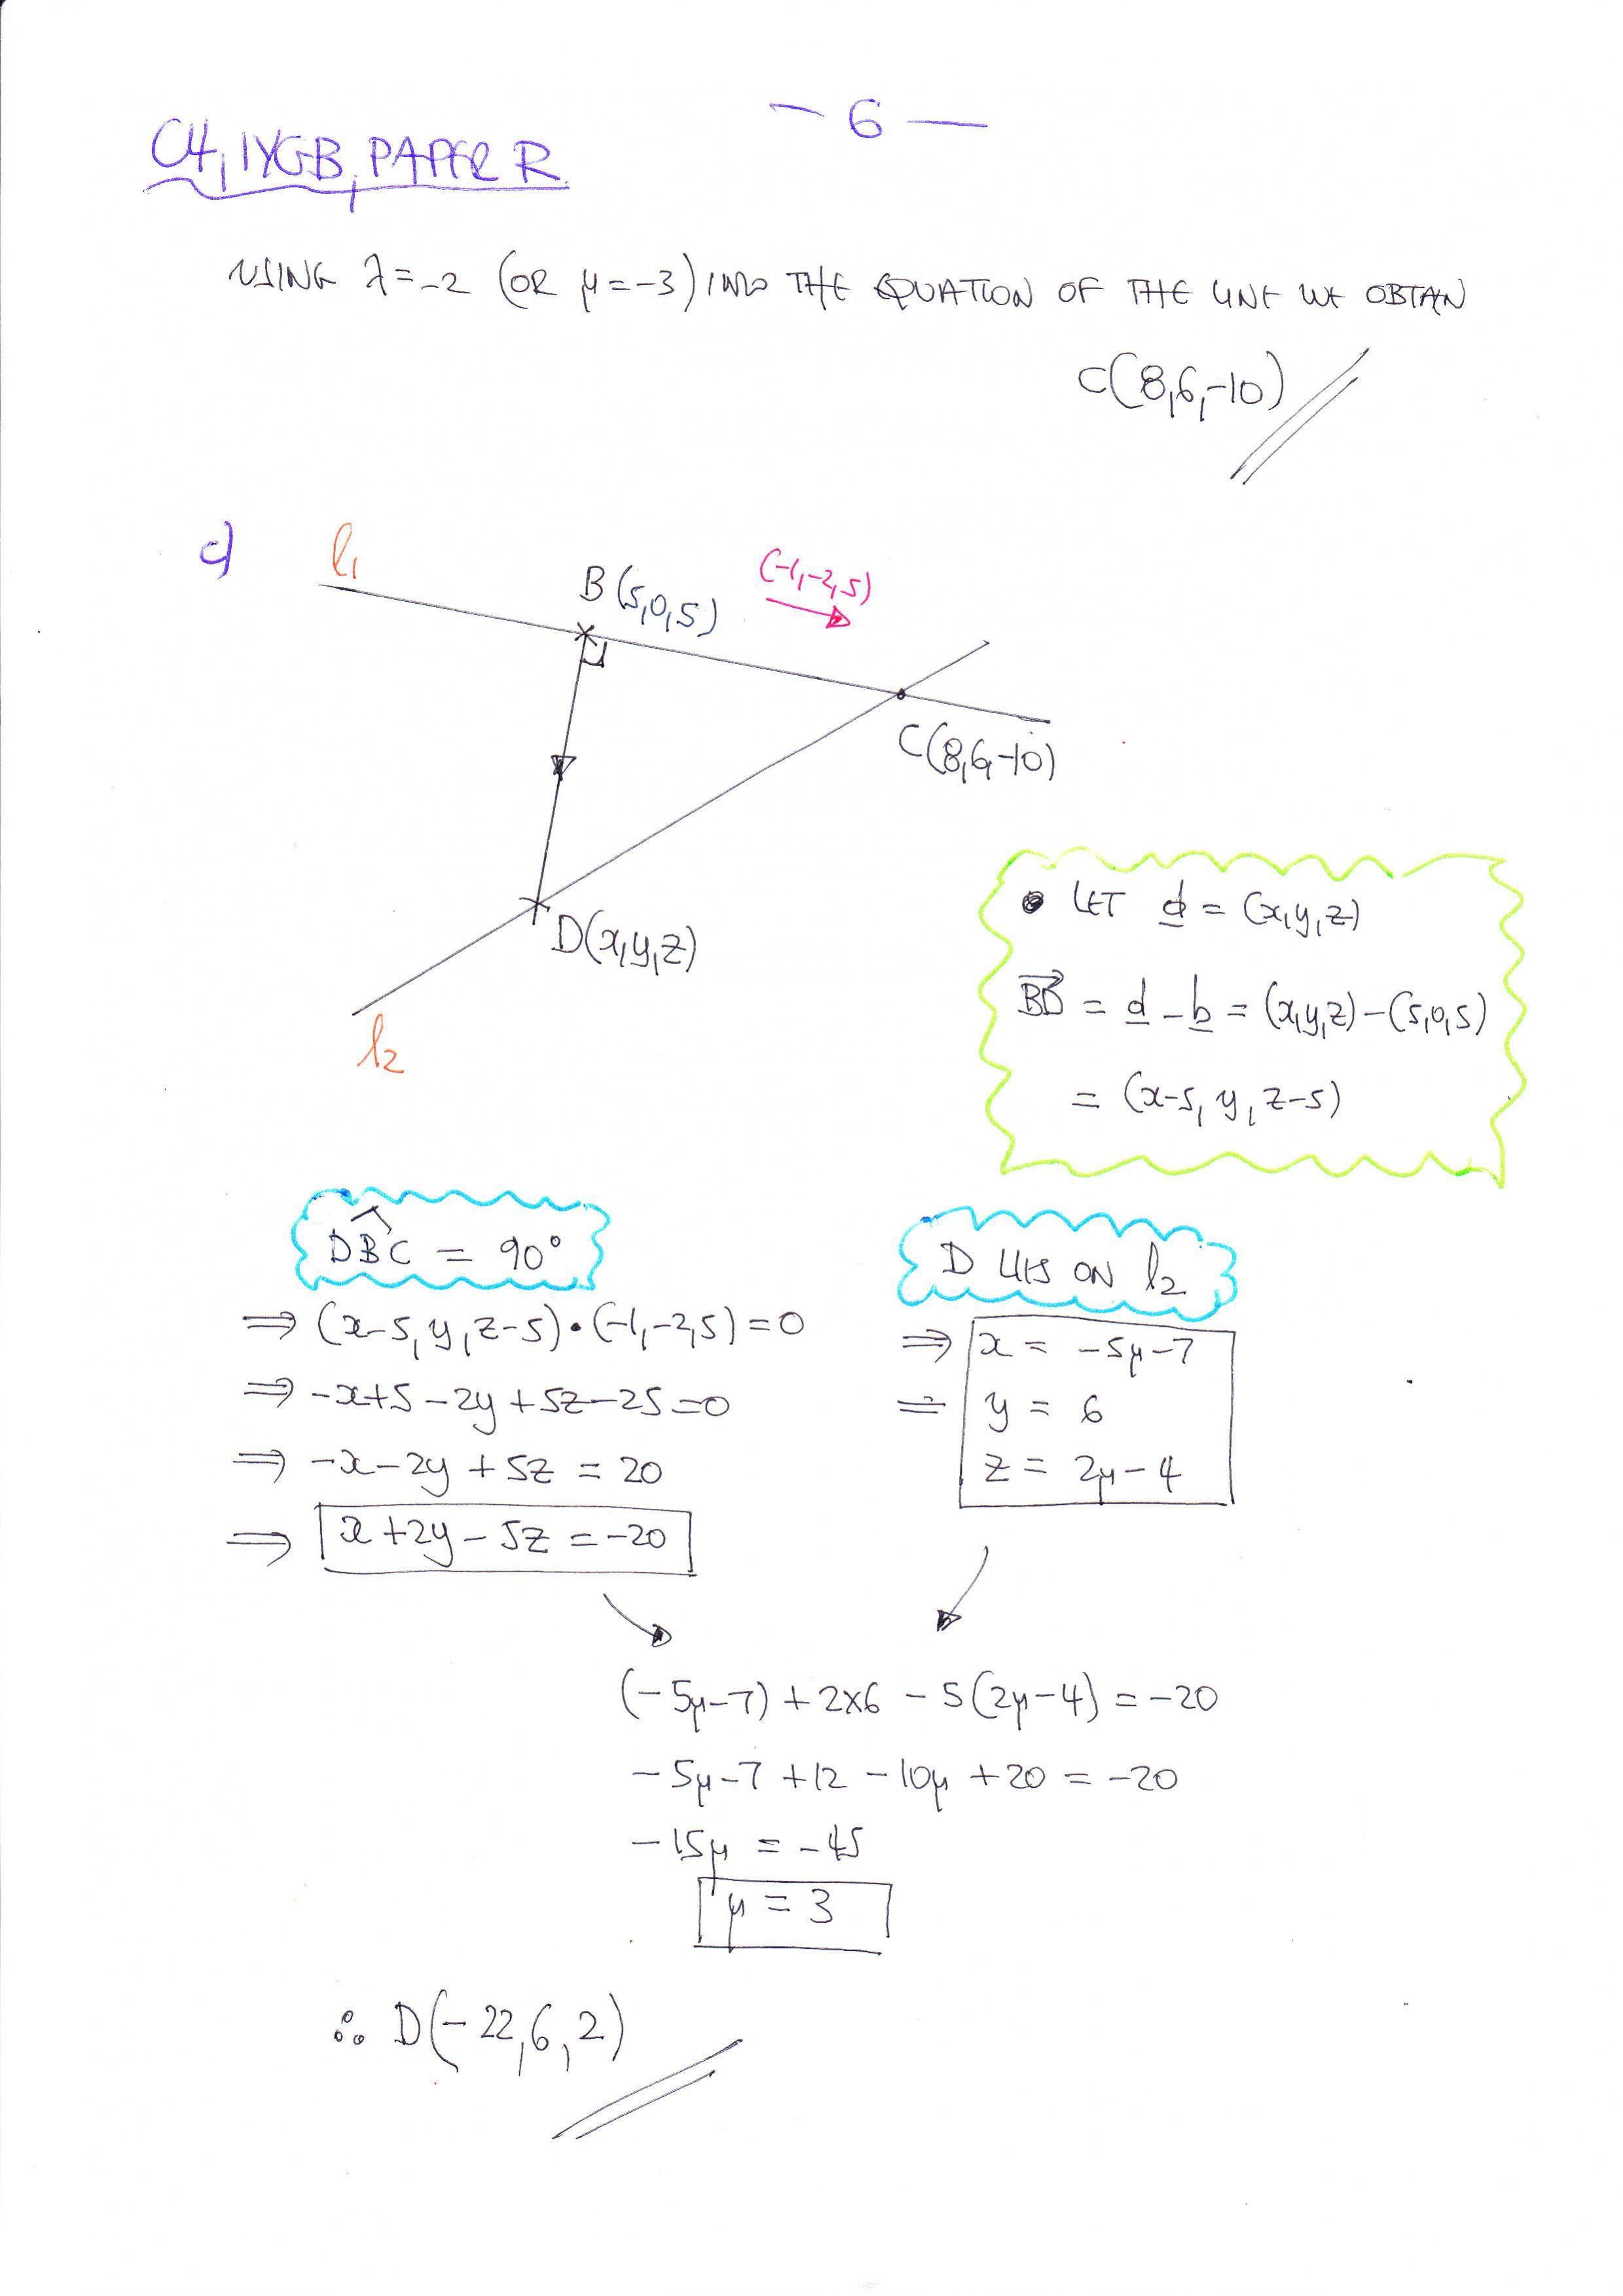 Name:  C4, IYGB, Paper R, page 6.jpg Views: 63 Size:  316.2 KB